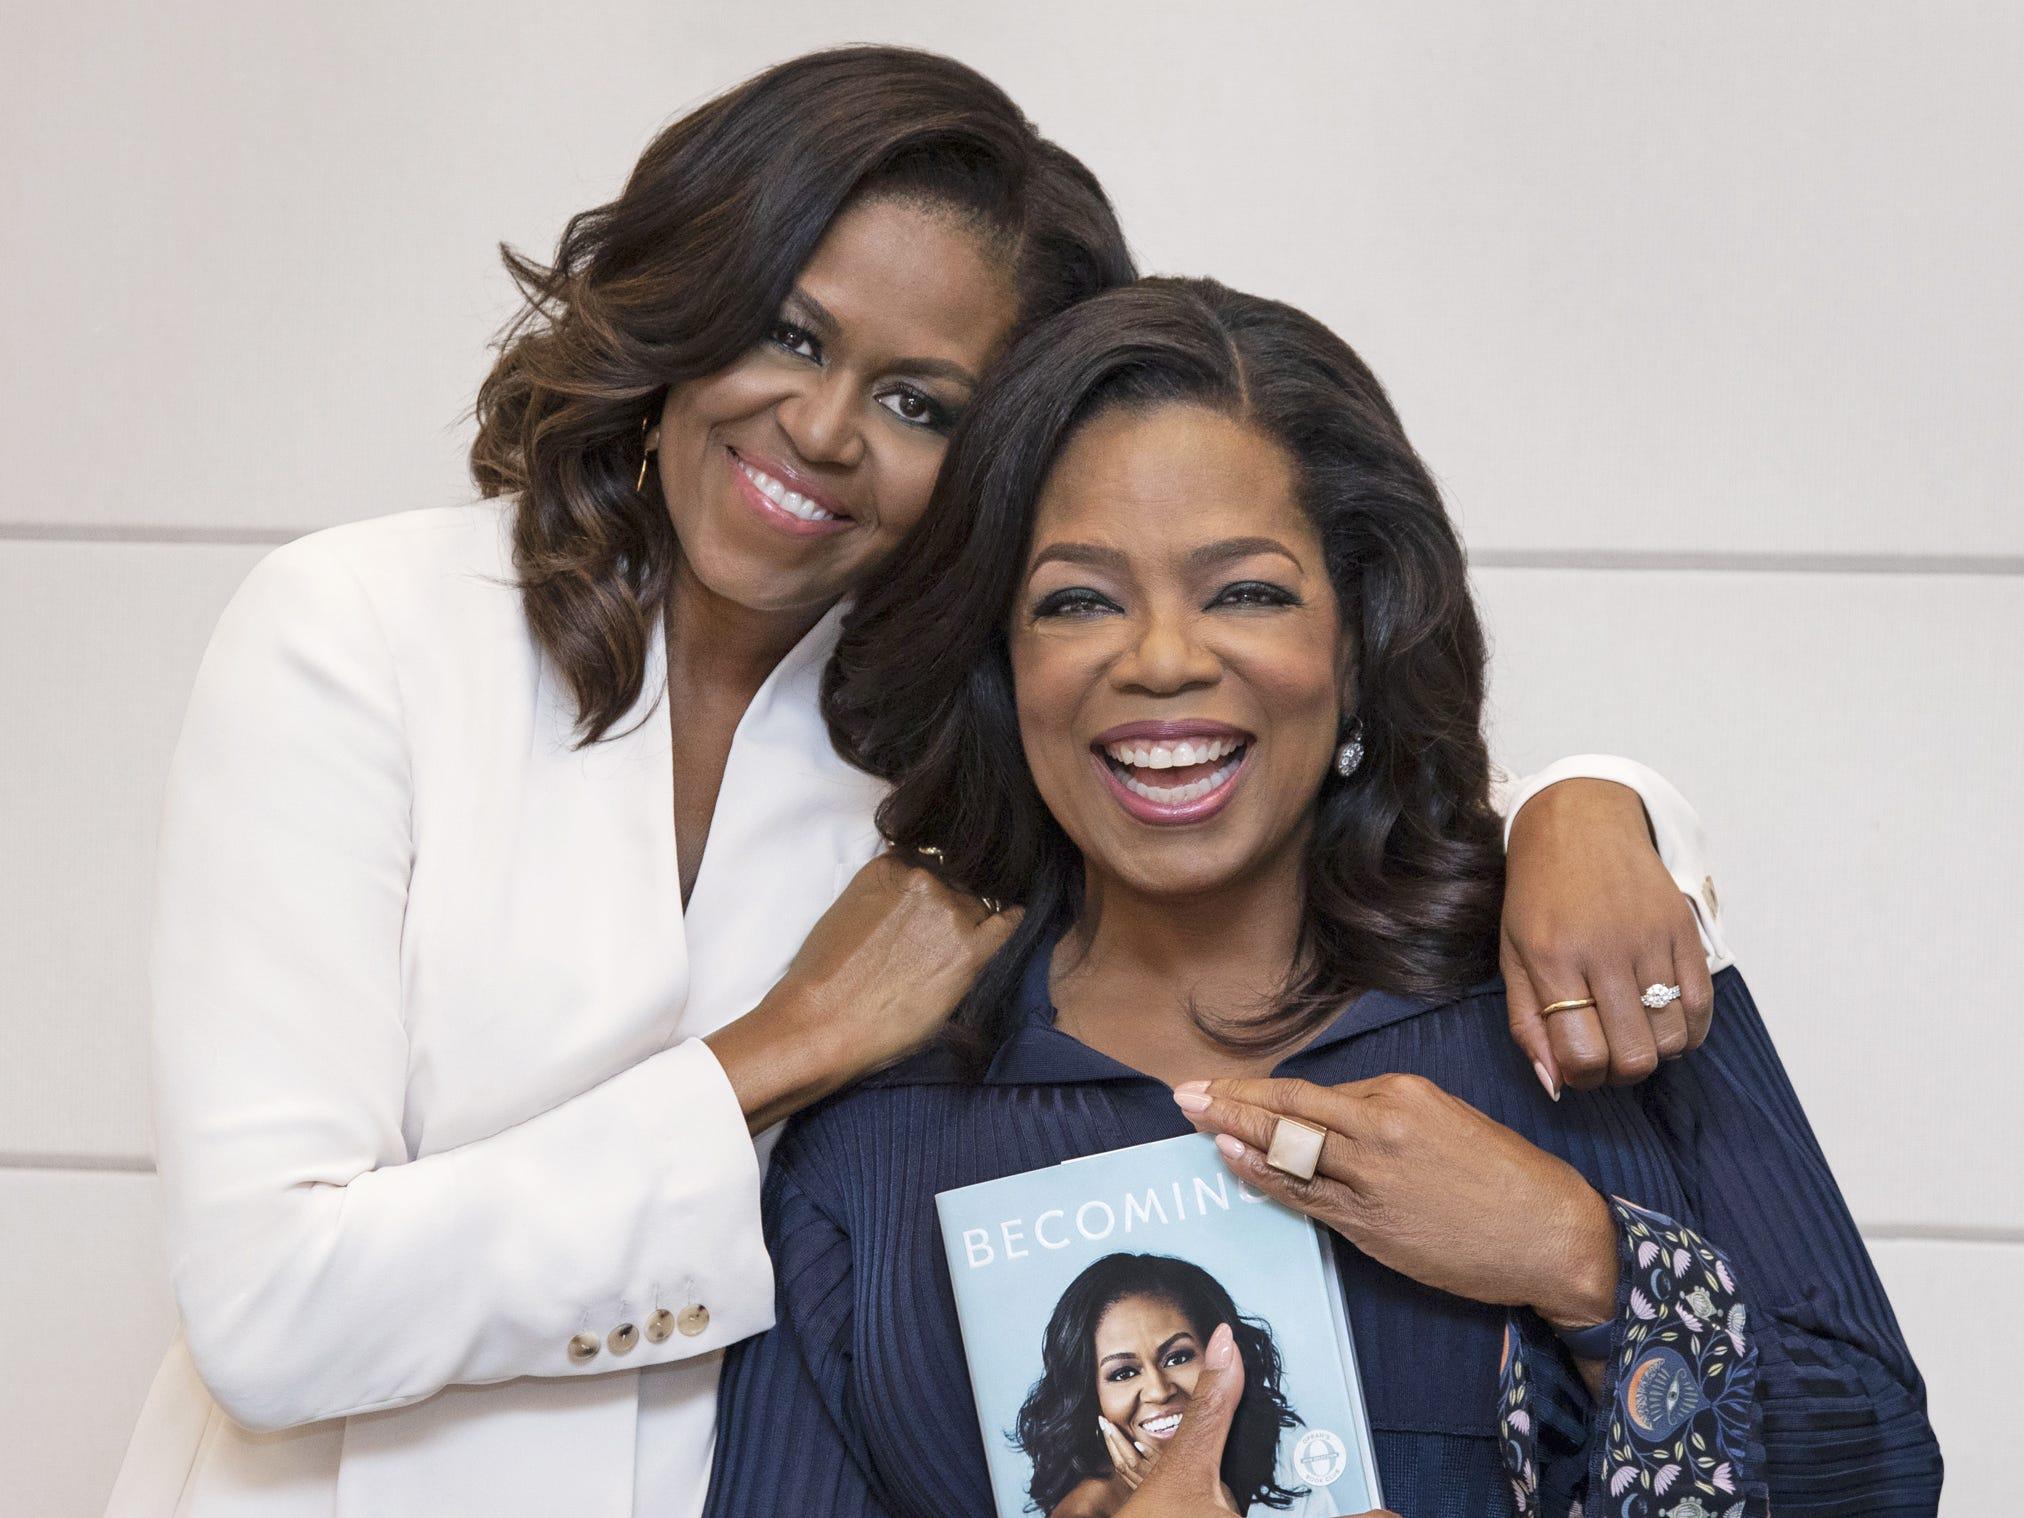 Oprah Winfrey picks Michelle Obama's memoir 'Becoming' for her book club